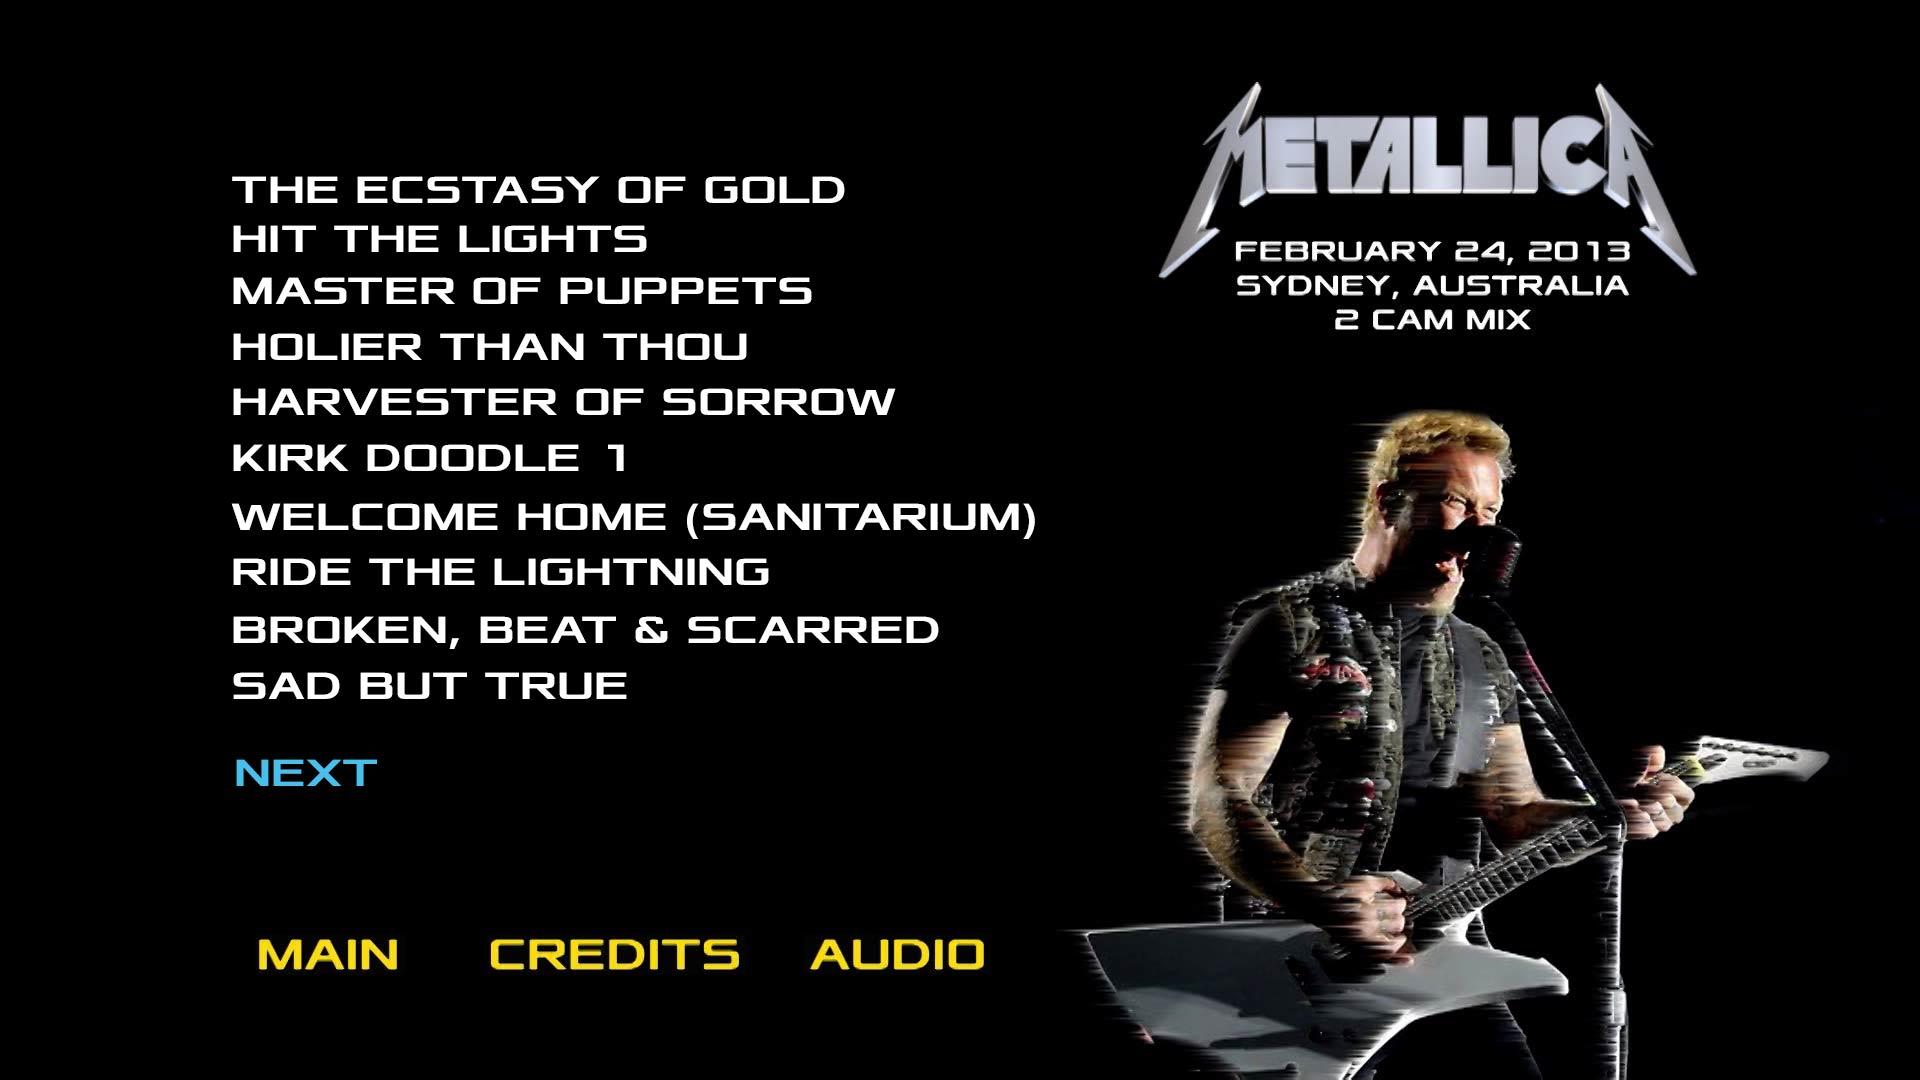 sydney-2013-2cam-songs